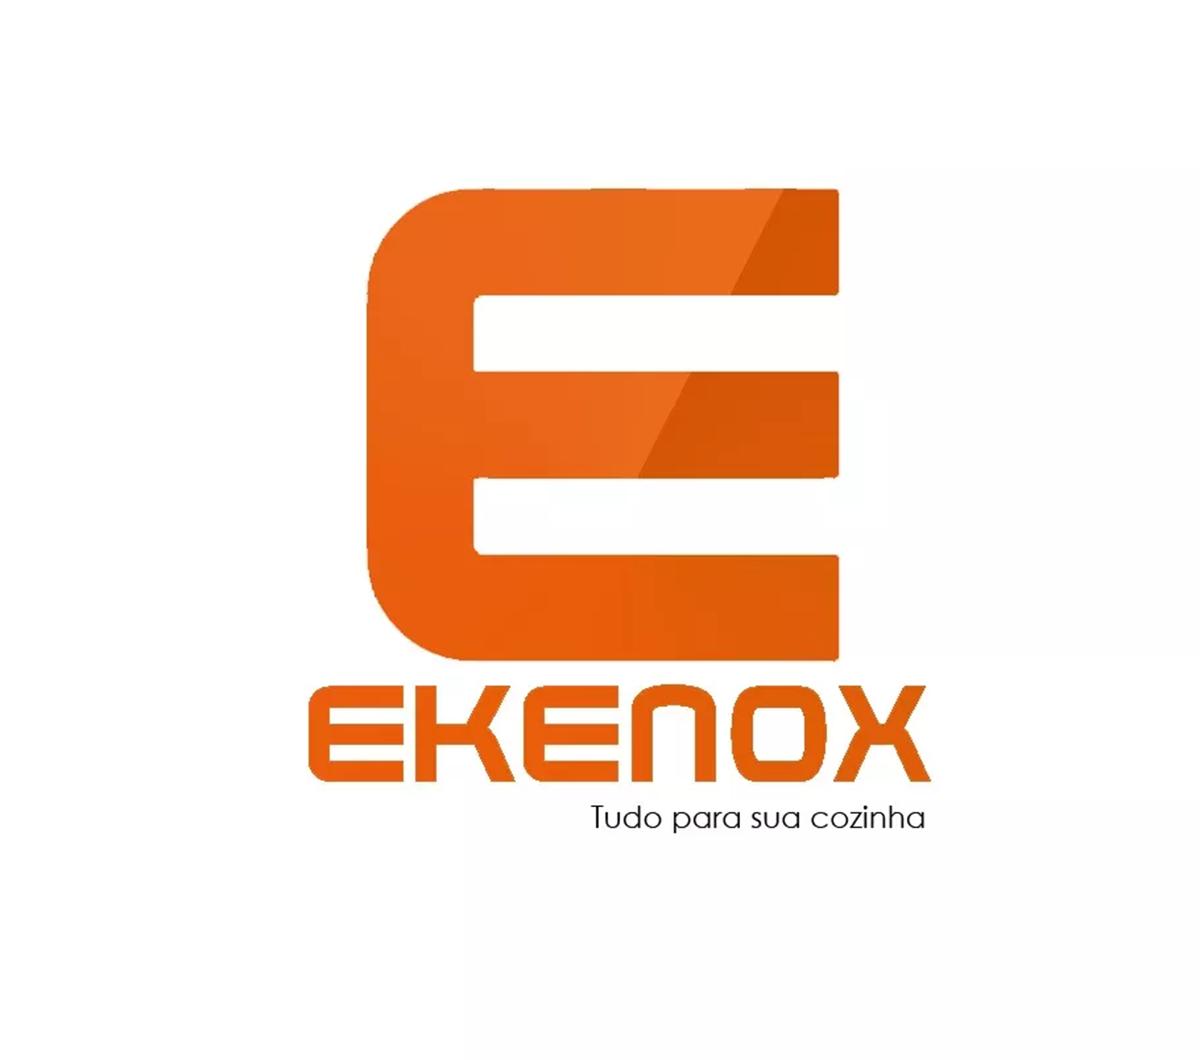 CHECK OUT PRETO 1,80 BILATERAL CAIXA DE SUPERMERCADO + PERFIL COLORIDO  - EKENOX- Equipamentos Industriais